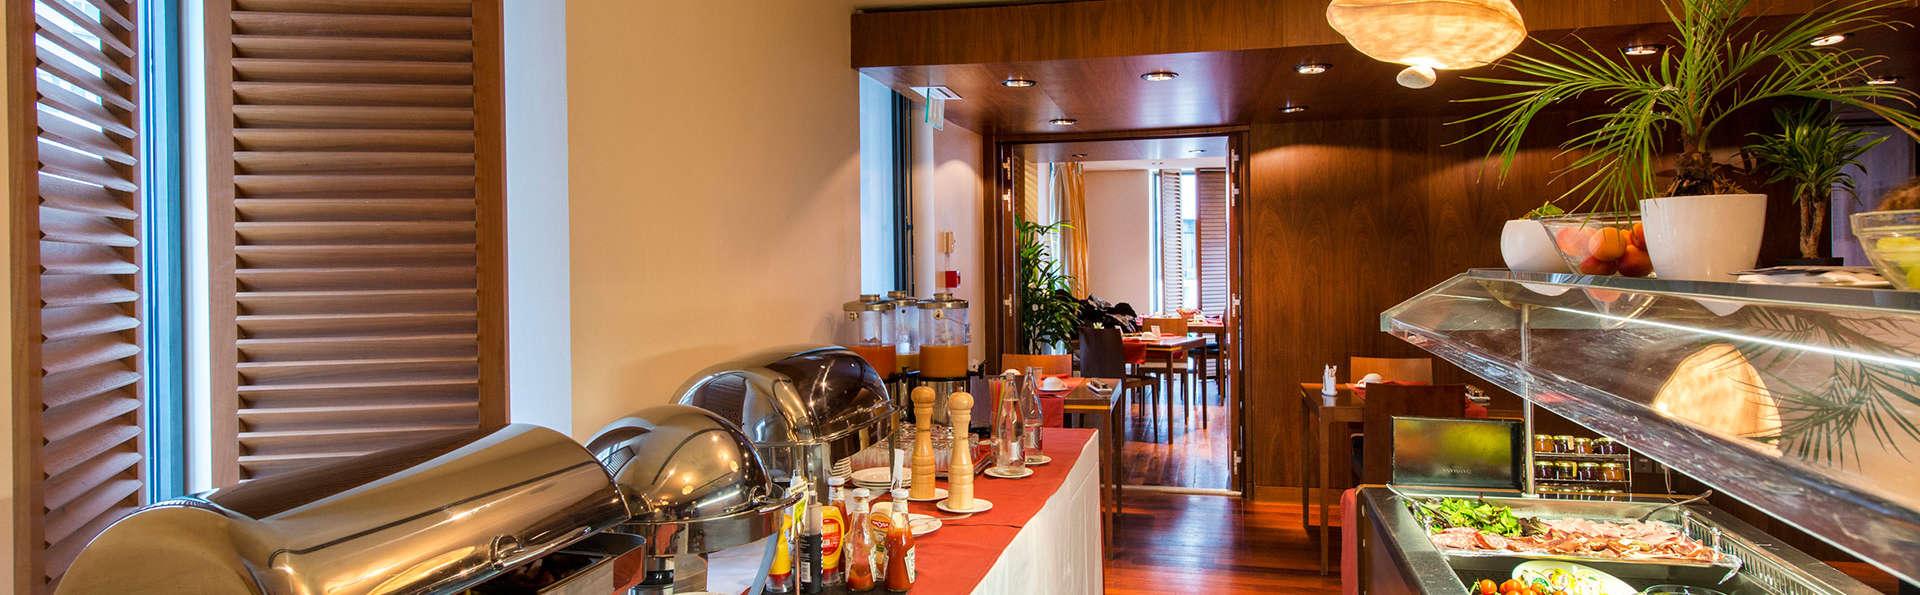 Hôtel Beau Rivage - EDIT_buffet.jpg